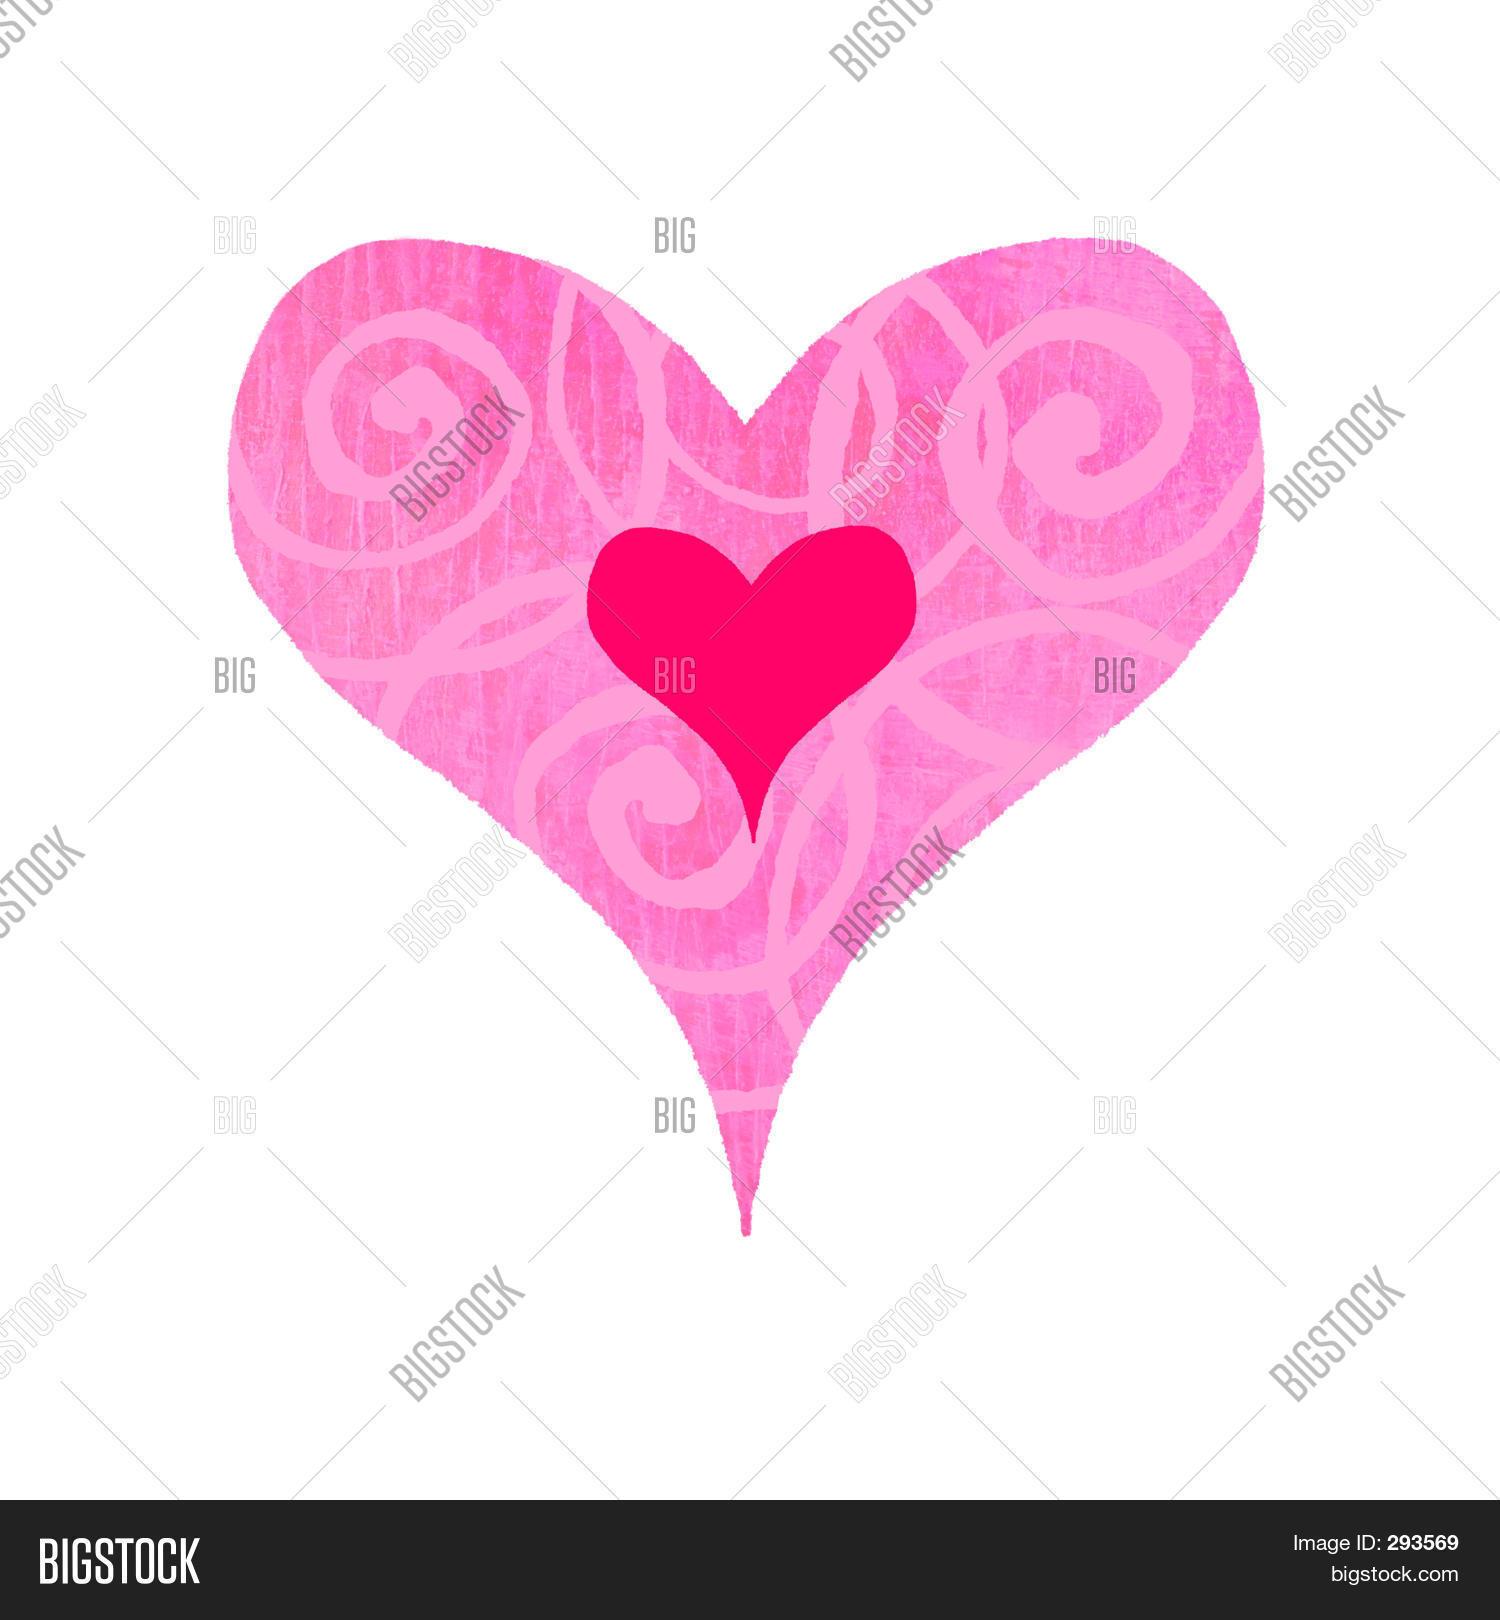 Sydän kuva